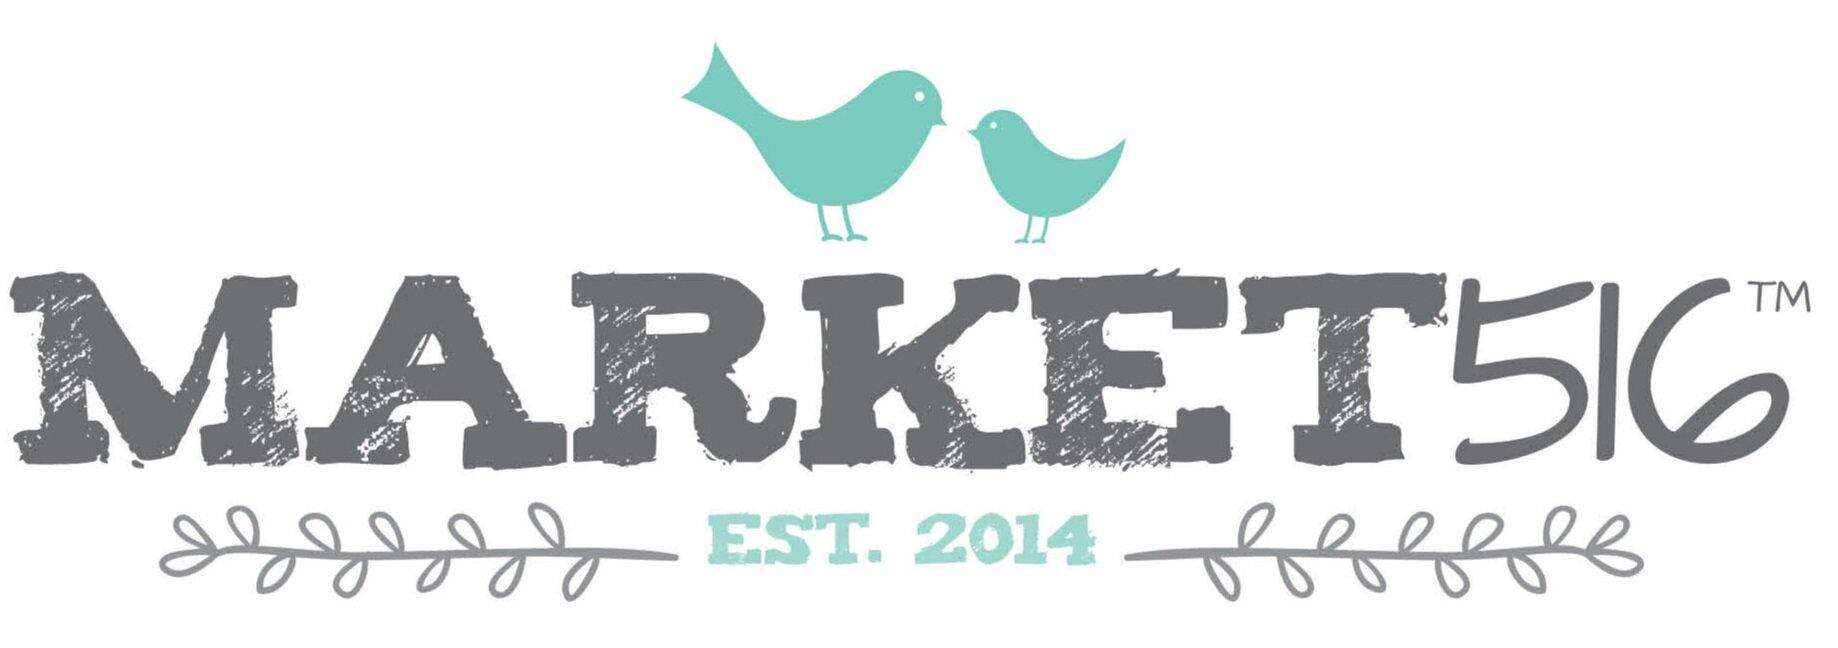 Market516_TealEst2014.jpg